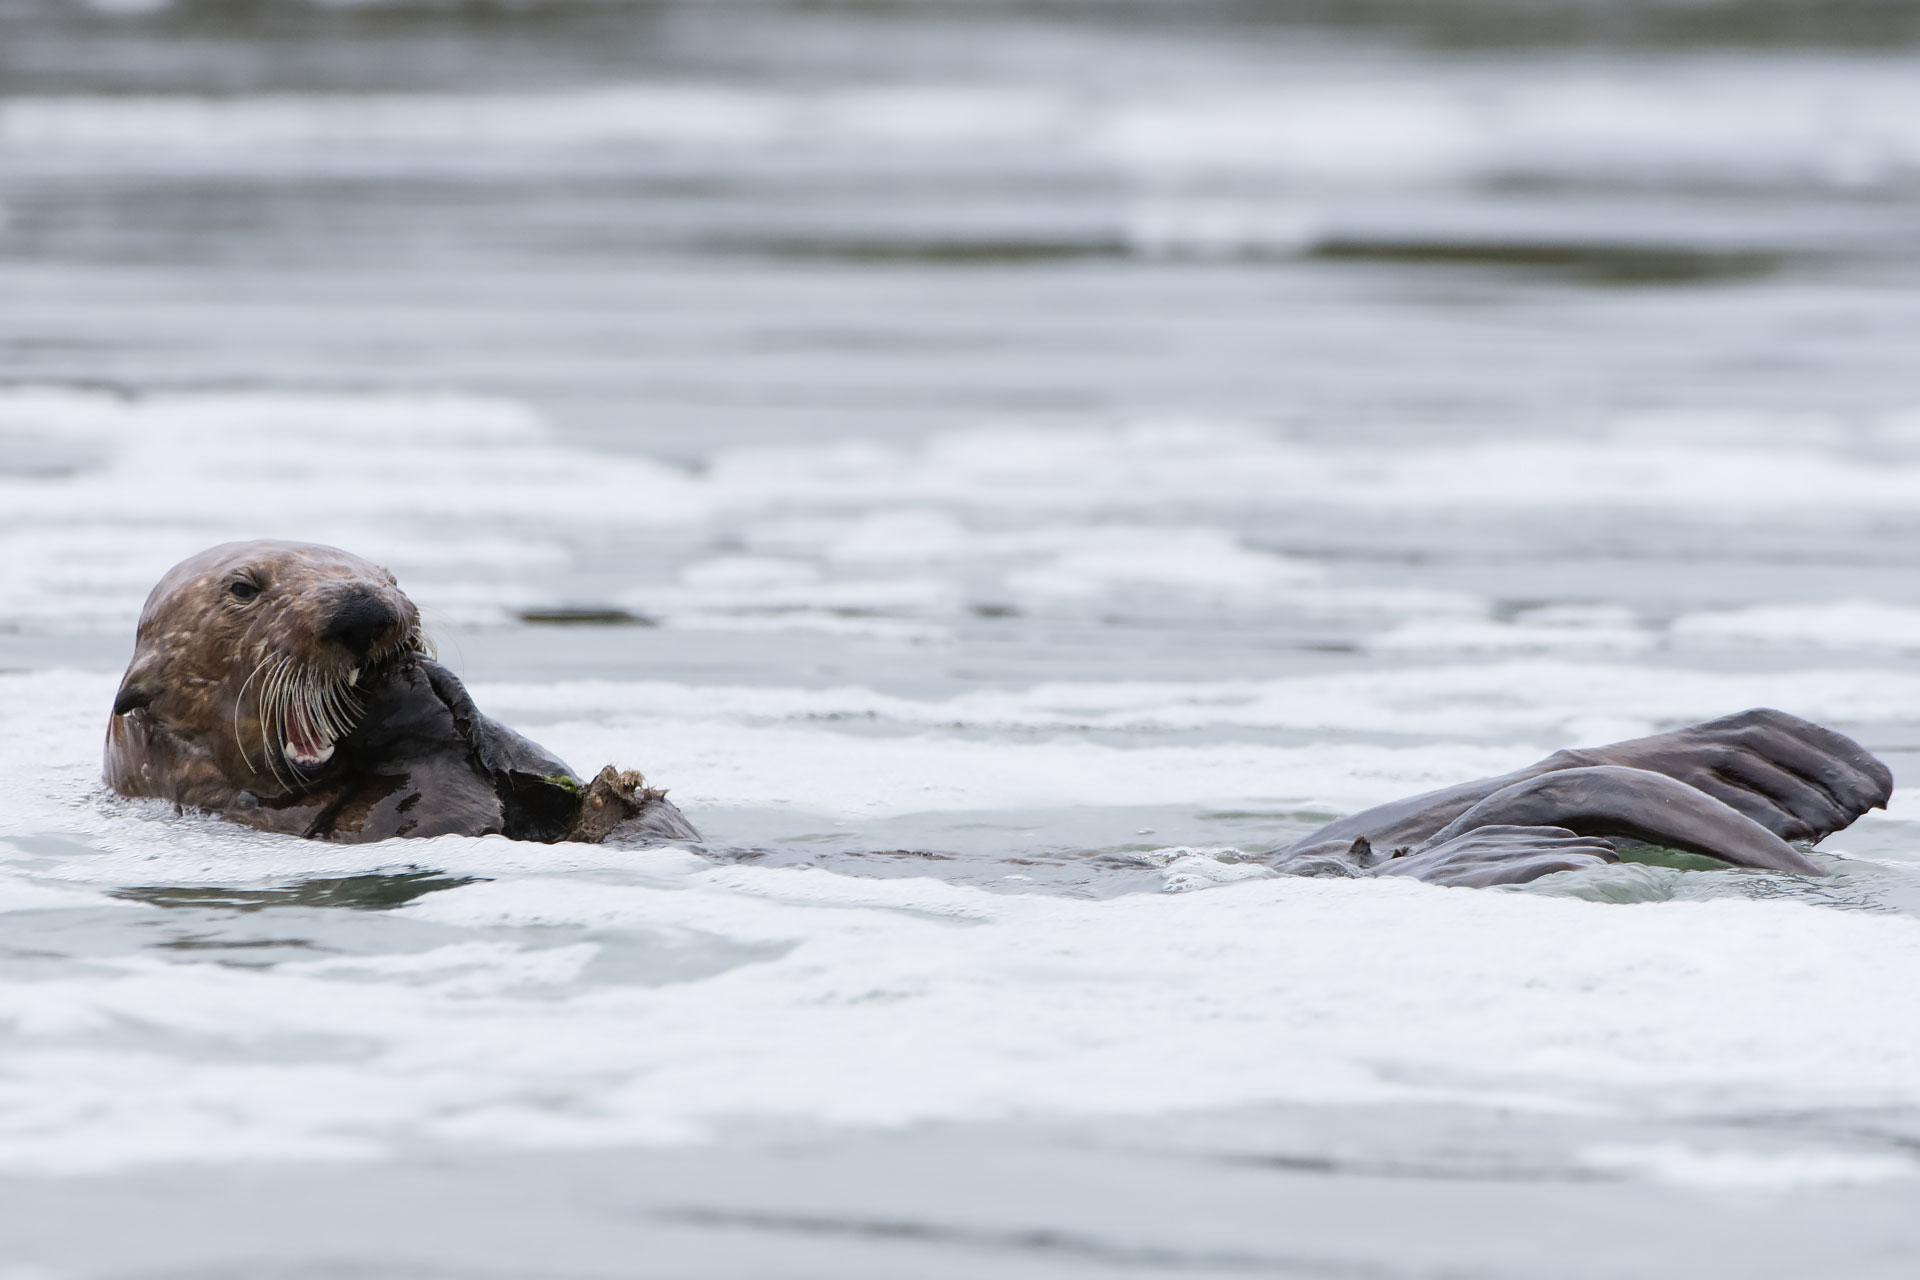 California Sea Otter  (Enhydra lutris)  - Eating Mussels Moss Landing  Nikon D7200 + Nikon 200-400mm f4 VR1 @ ISO 800